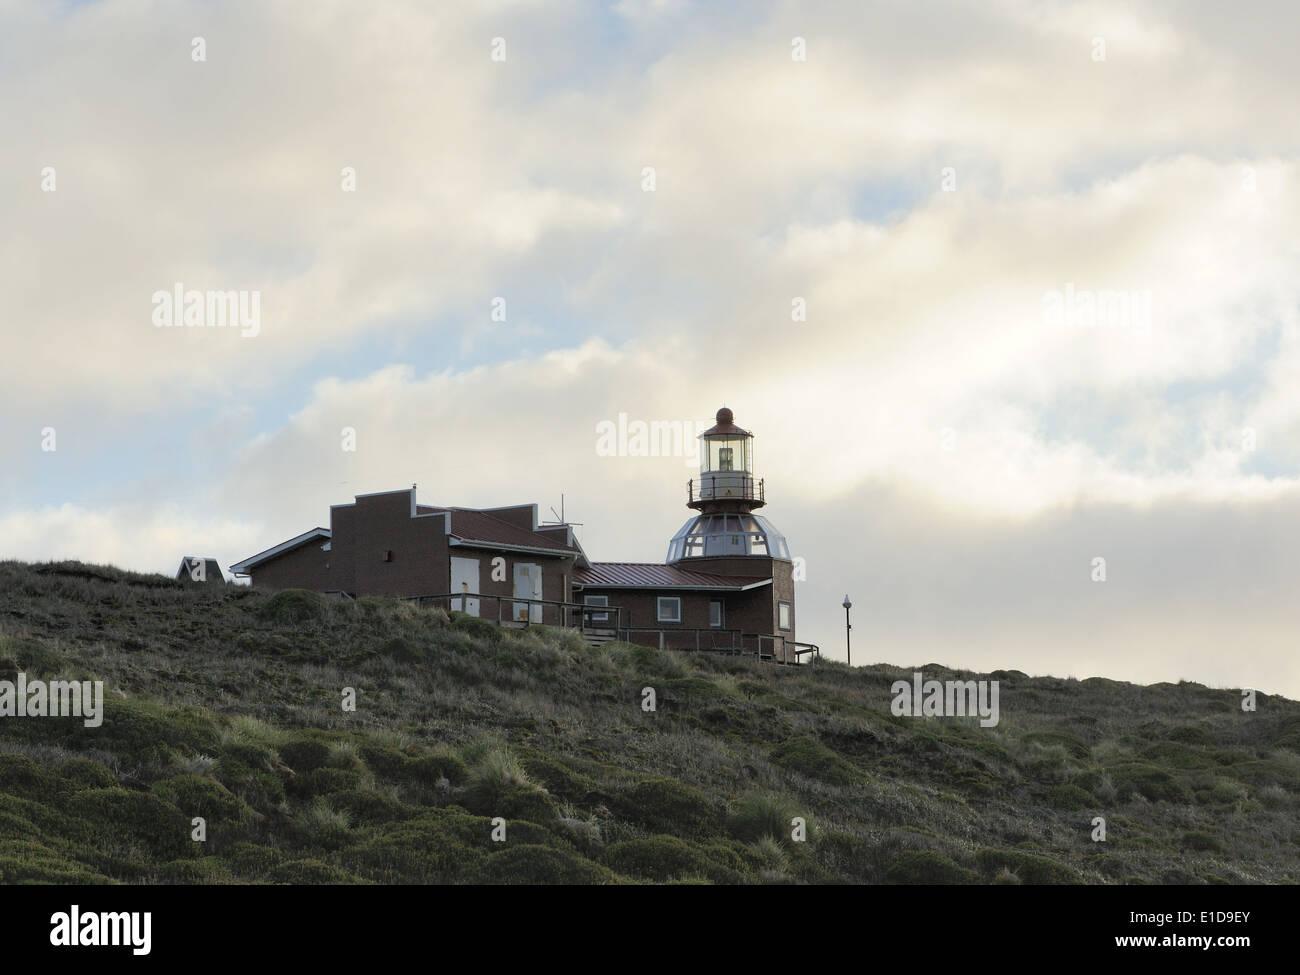 The Cape Horn lighthouse, Faro Monumental Cabo de Hornos, Cape HornCape Horn National Park. Cabo de Hornos, Isla Hornos. Chile - Stock Image